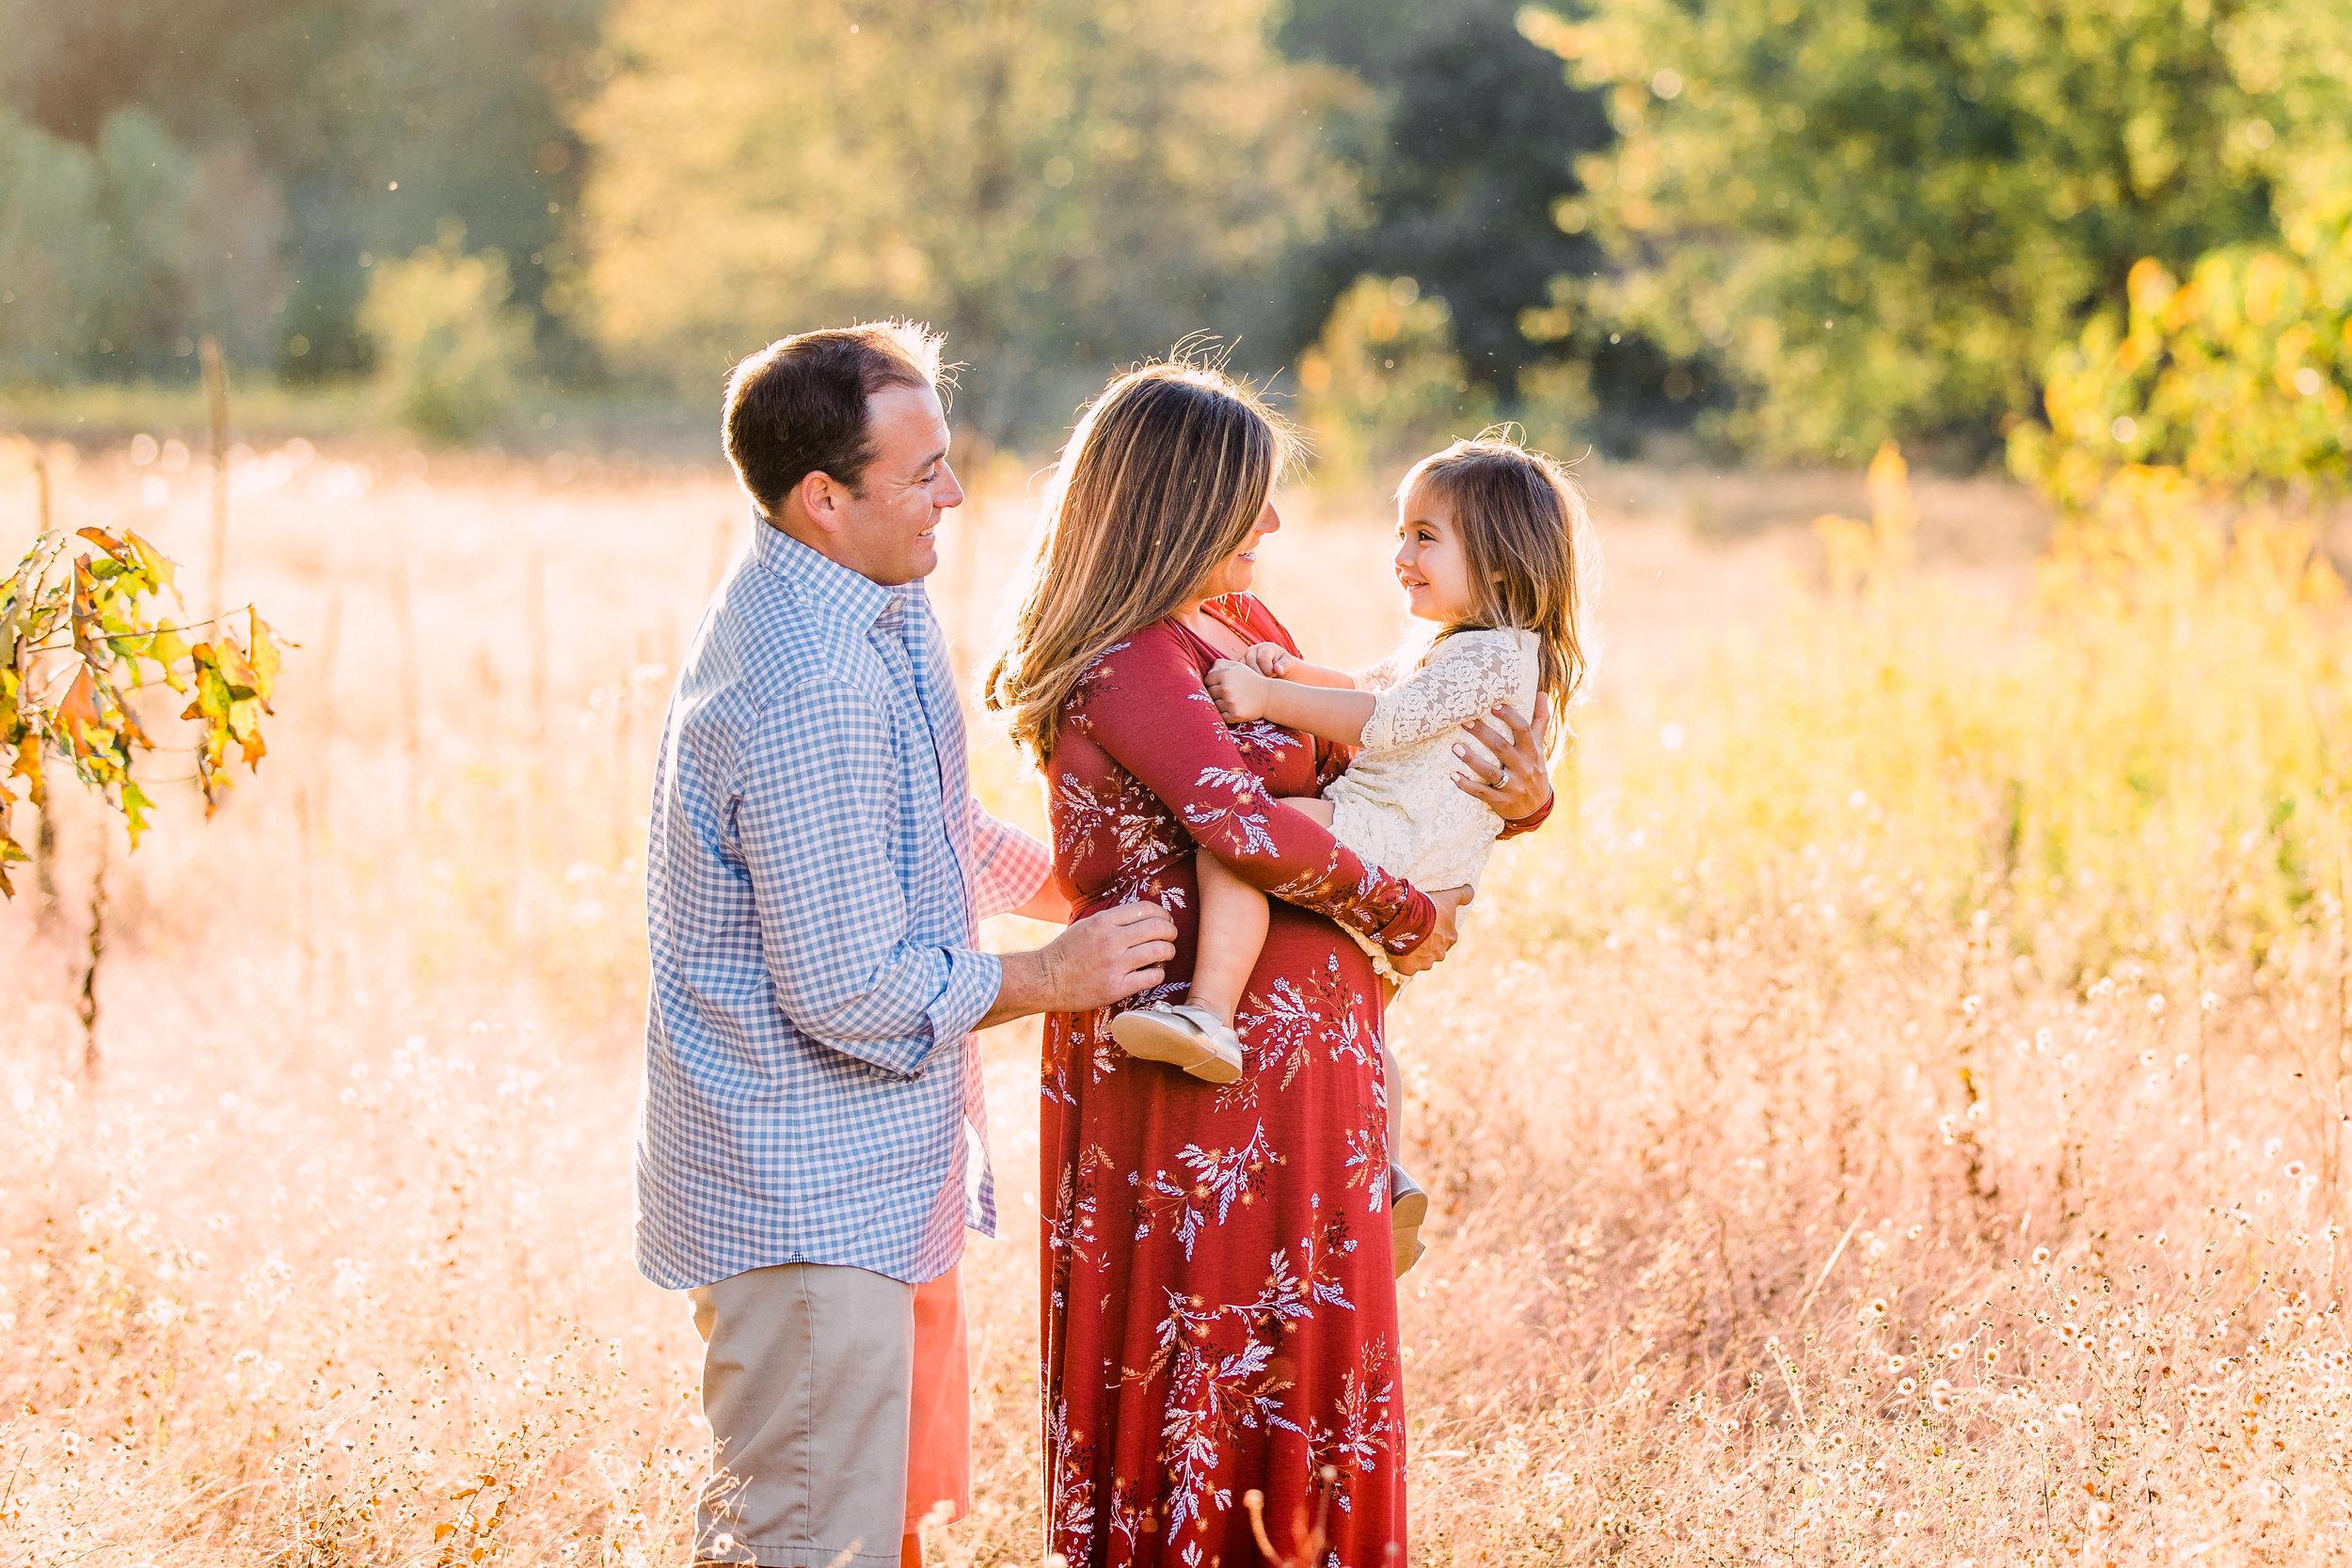 SMP_Diana Hicks_Maternity_Sept 2017-12.jpg